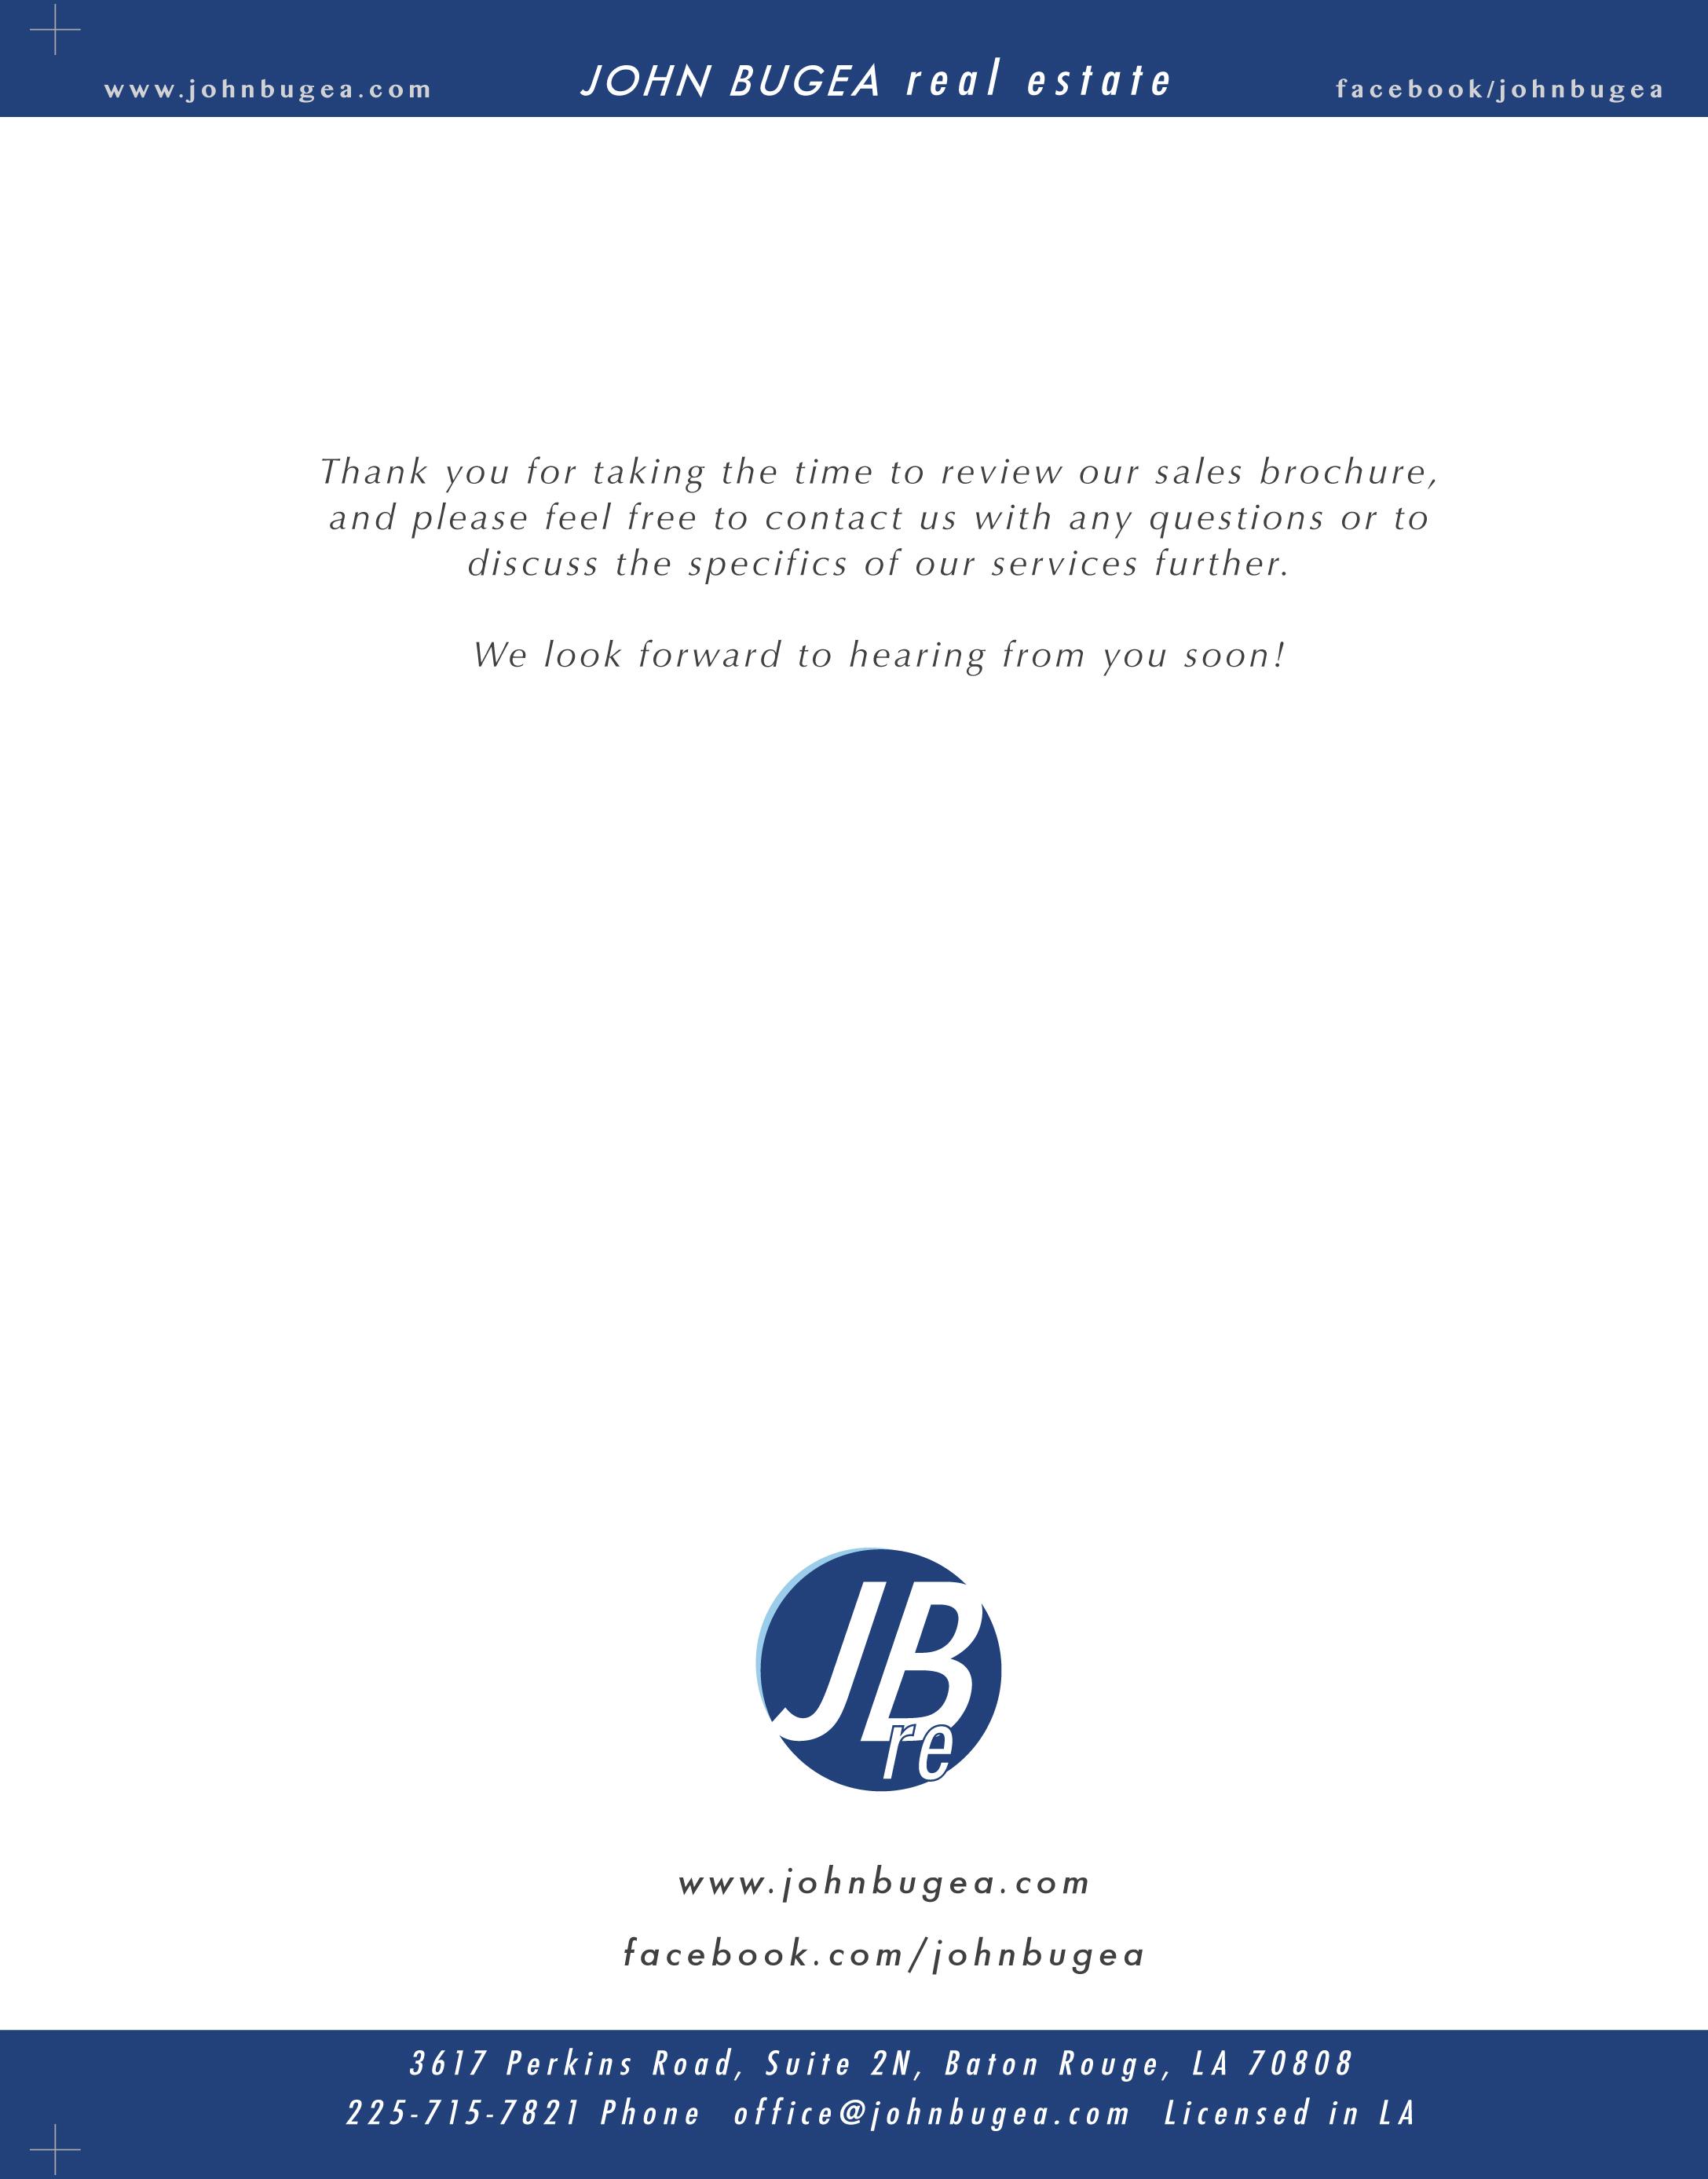 Listing Brochure copy 8.jpg